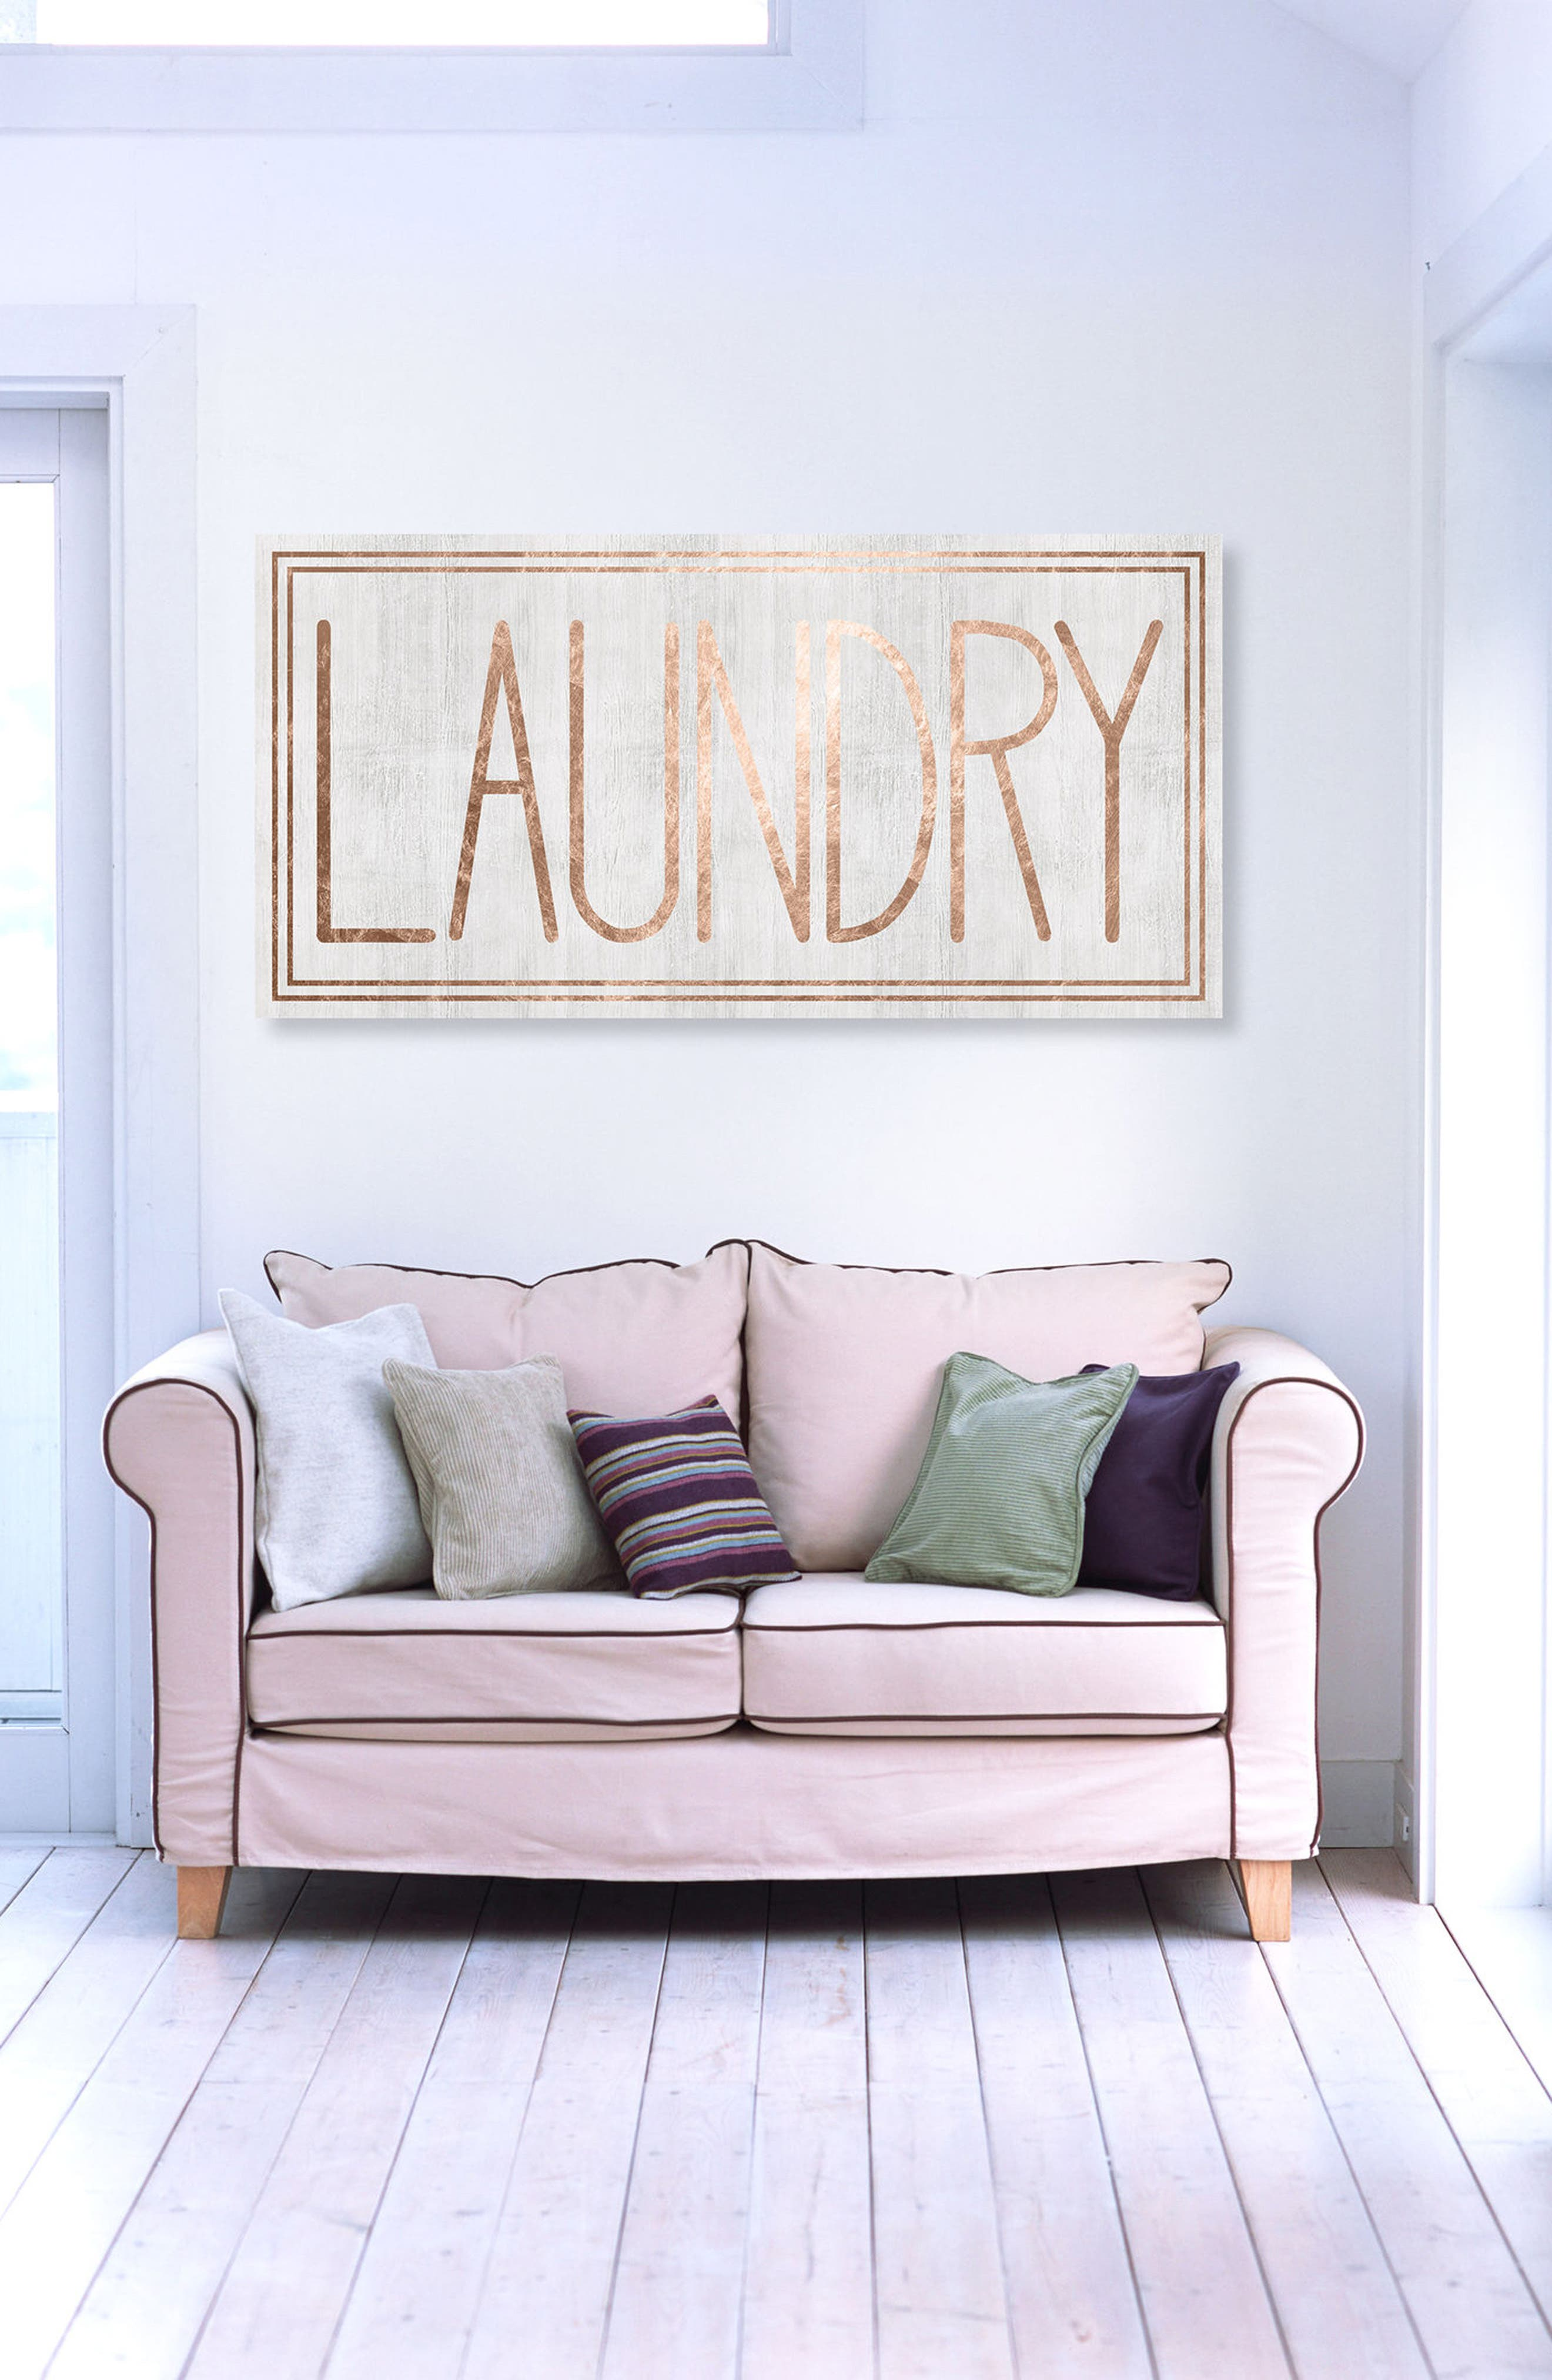 Laundry Canvas Wall Art,                             Alternate thumbnail 2, color,                             White